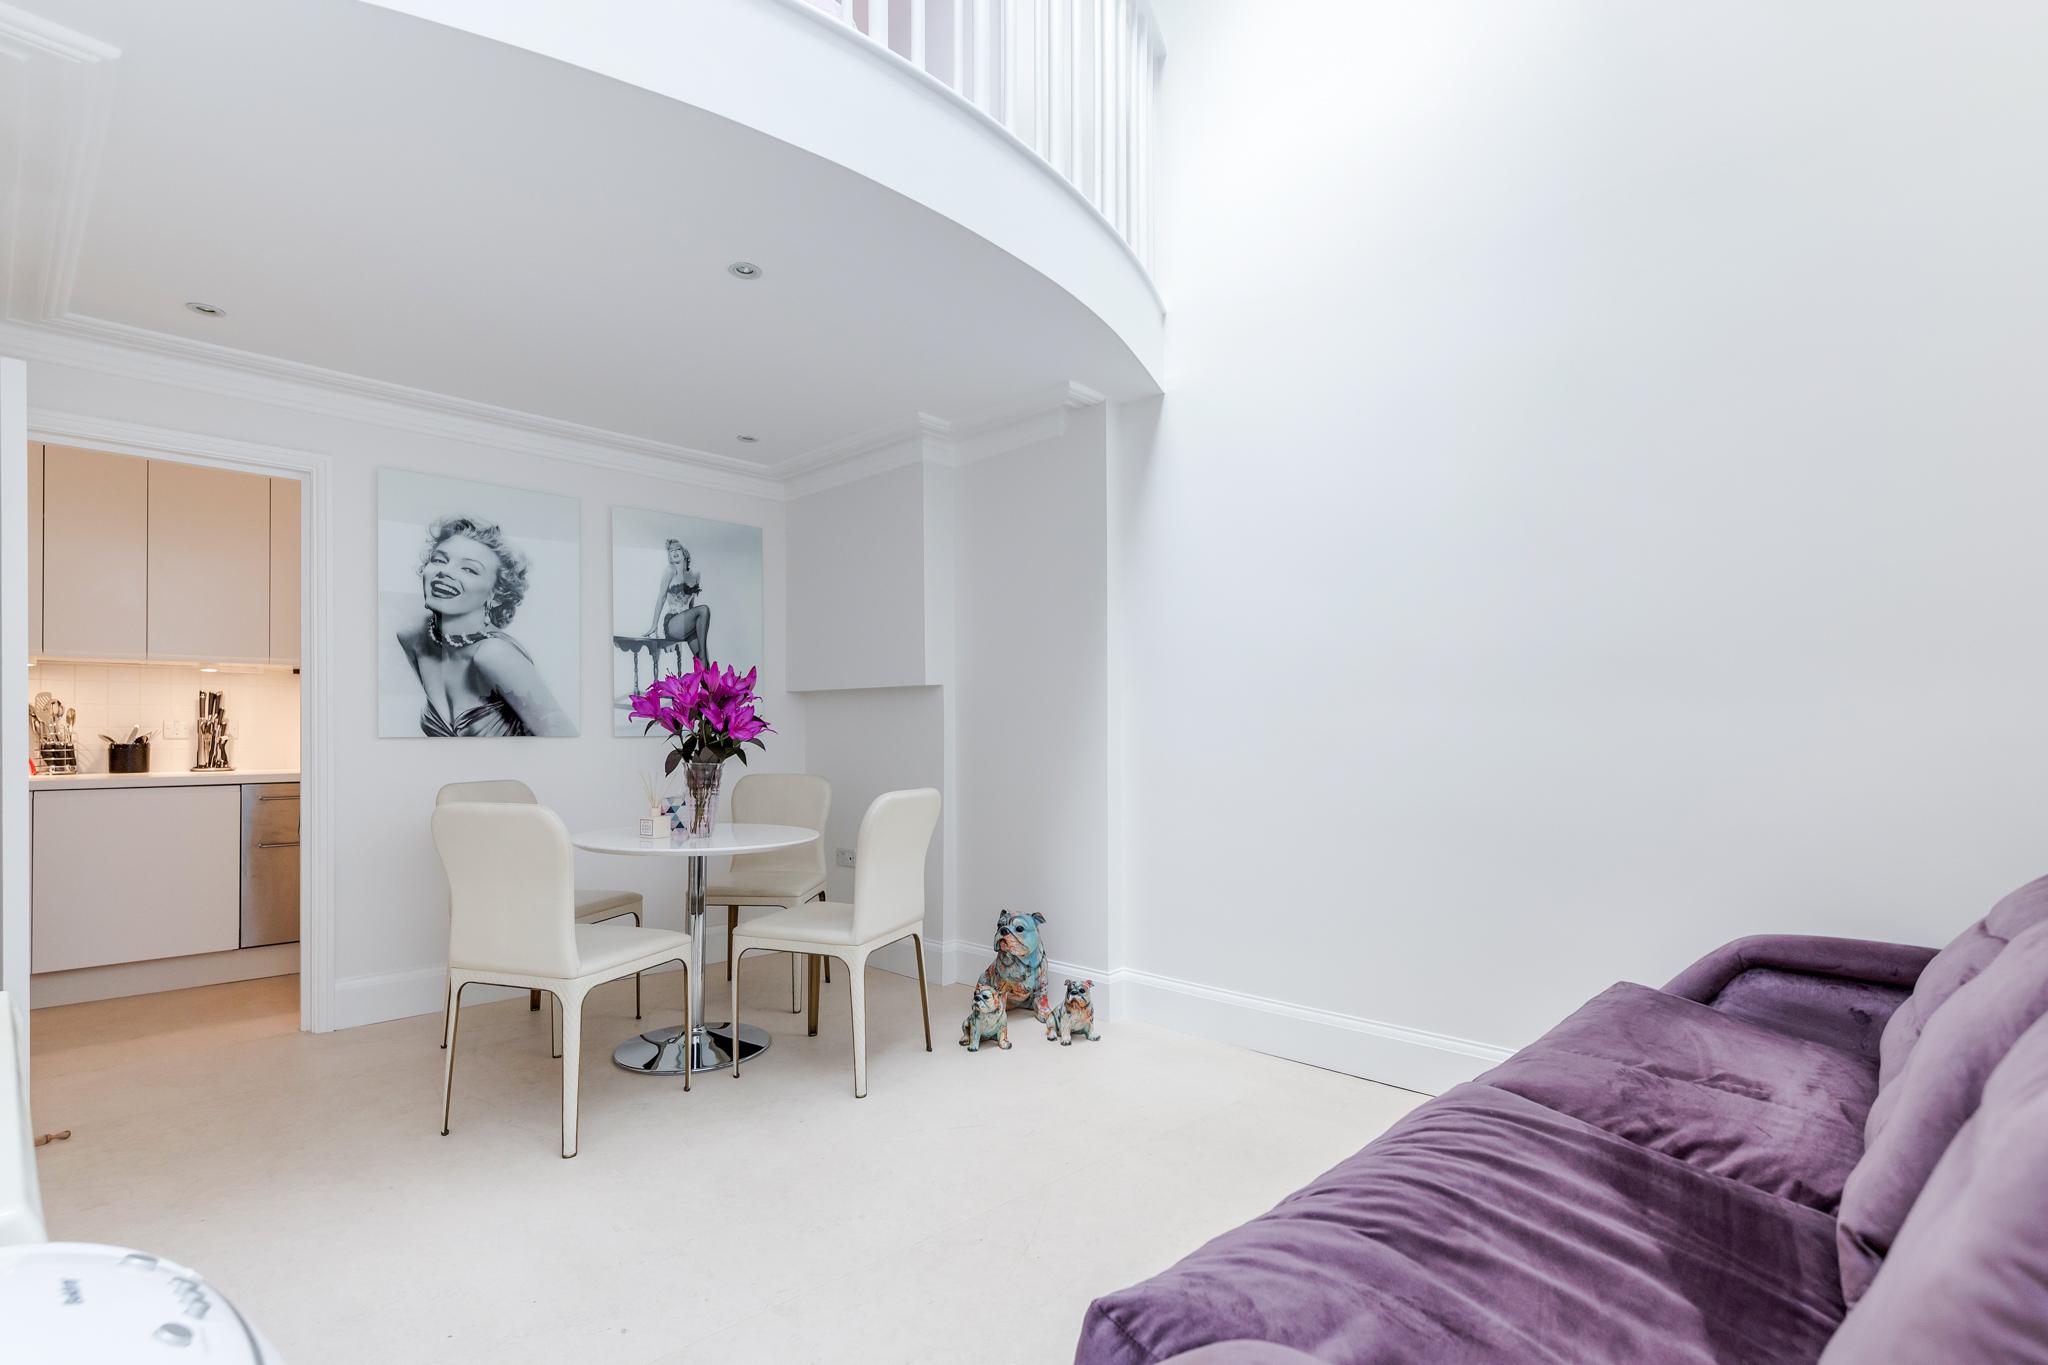 Apartment Distinctive Kensington apt for 3 with Mezzanine photo 23290248